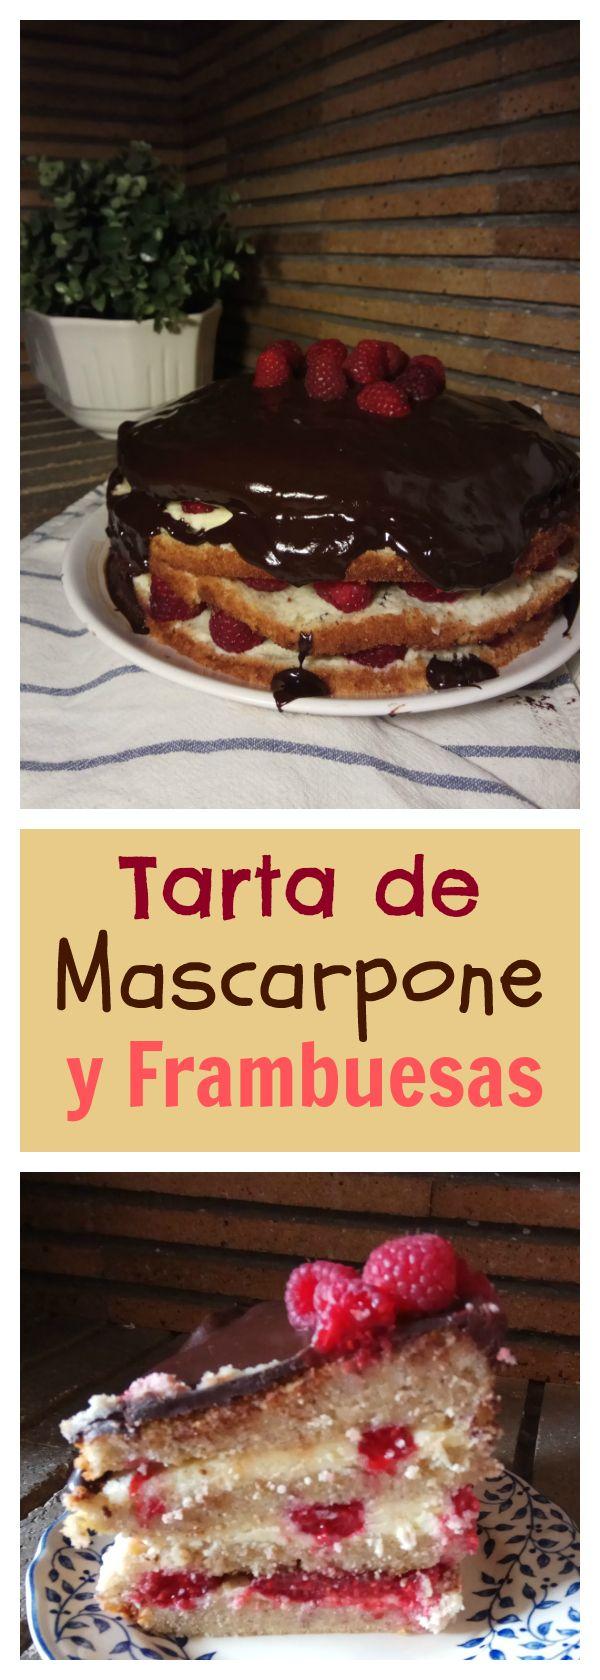 Tarta de Mascarpone y Frambuesas | Videoreceta | Tasty Details